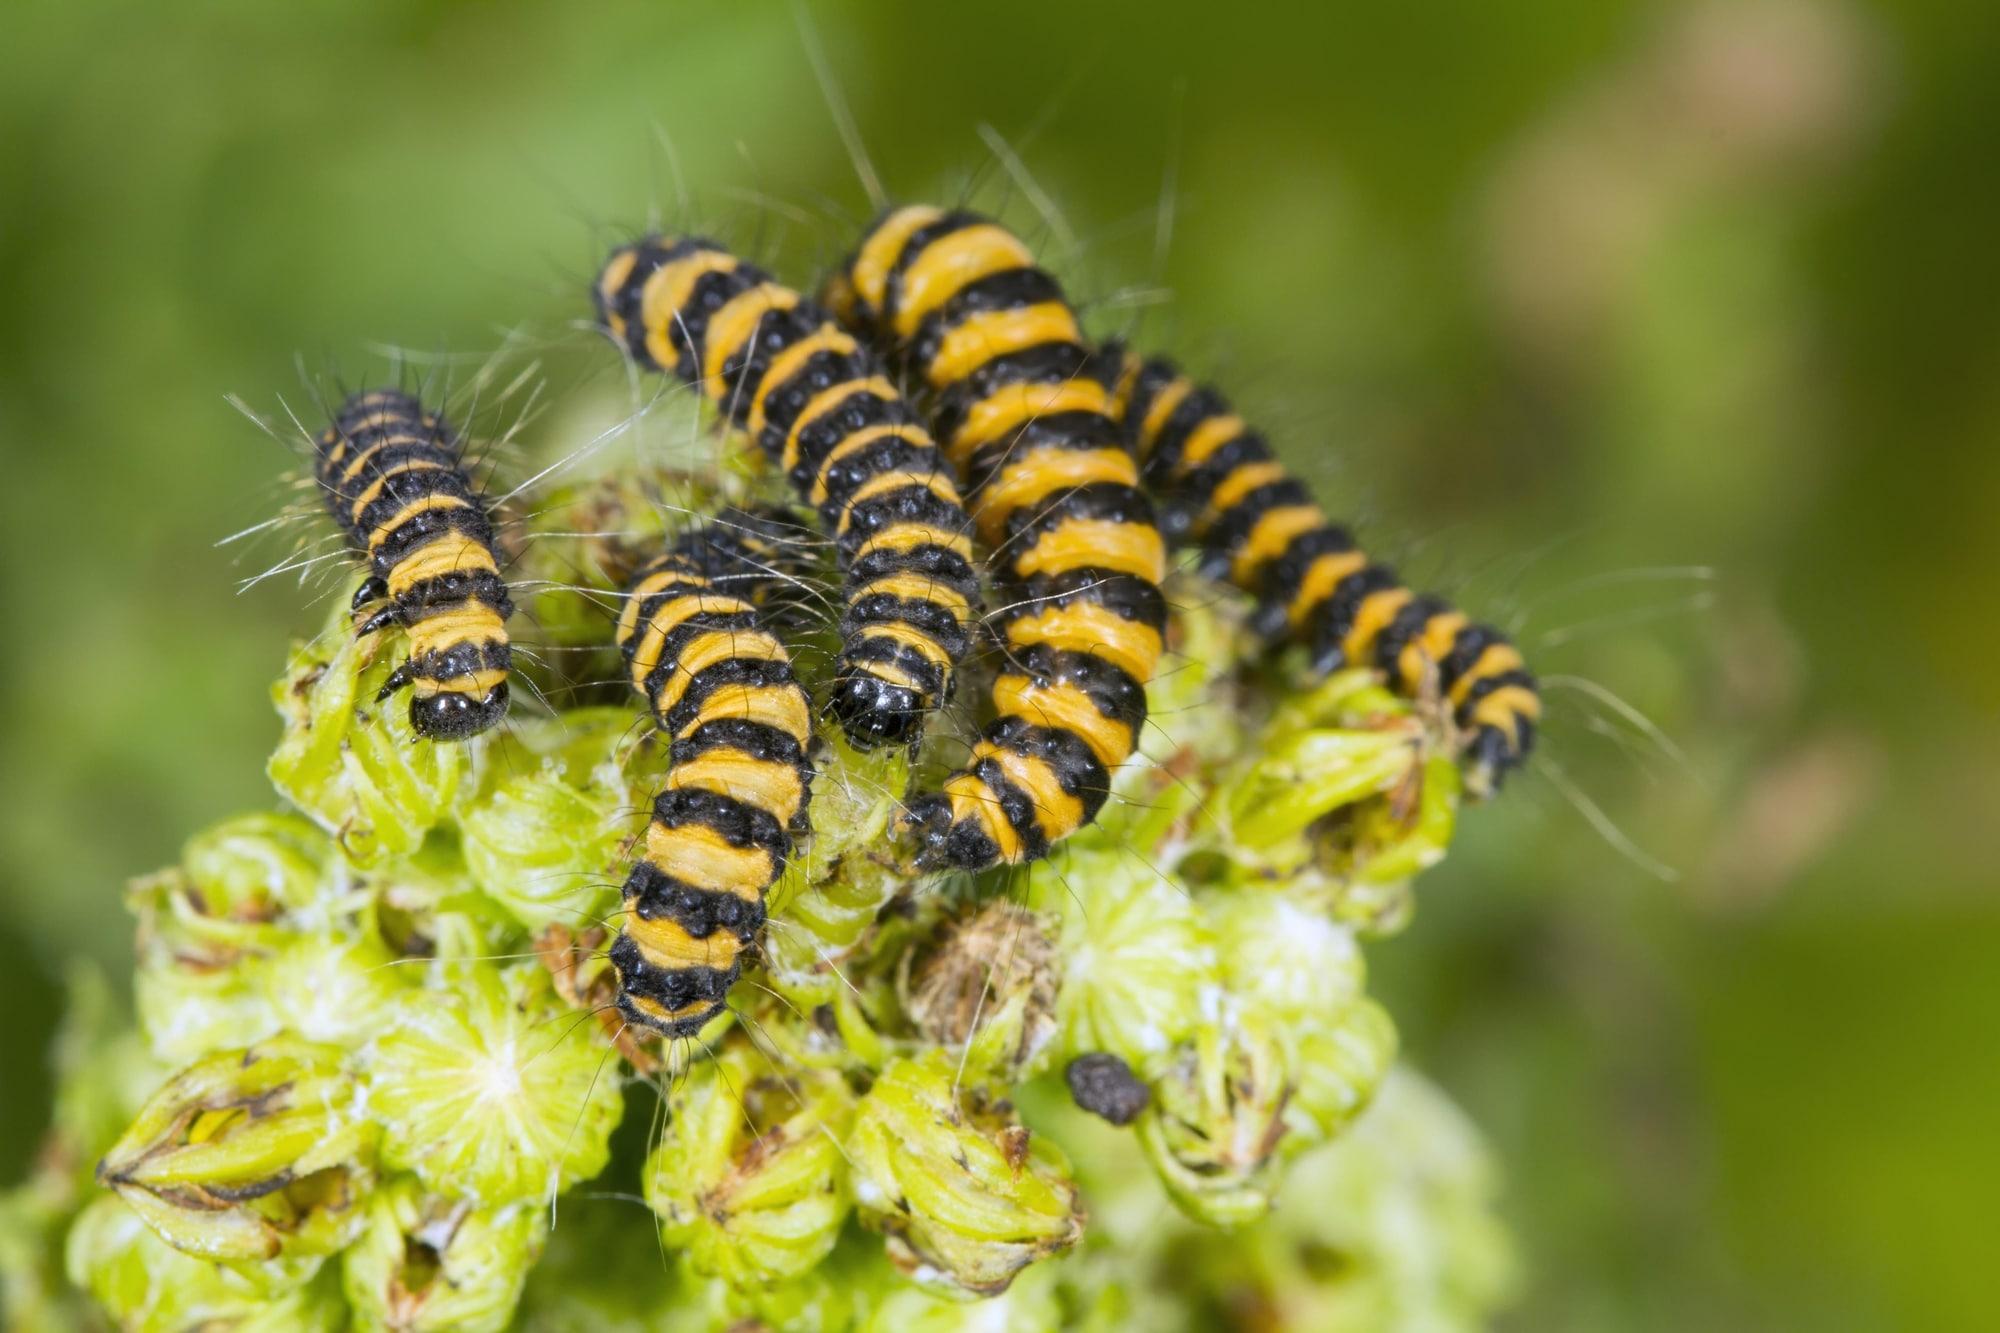 Cinnabar Moth (Tyria jacobaeae), caterpillars, feeding on Ragwort